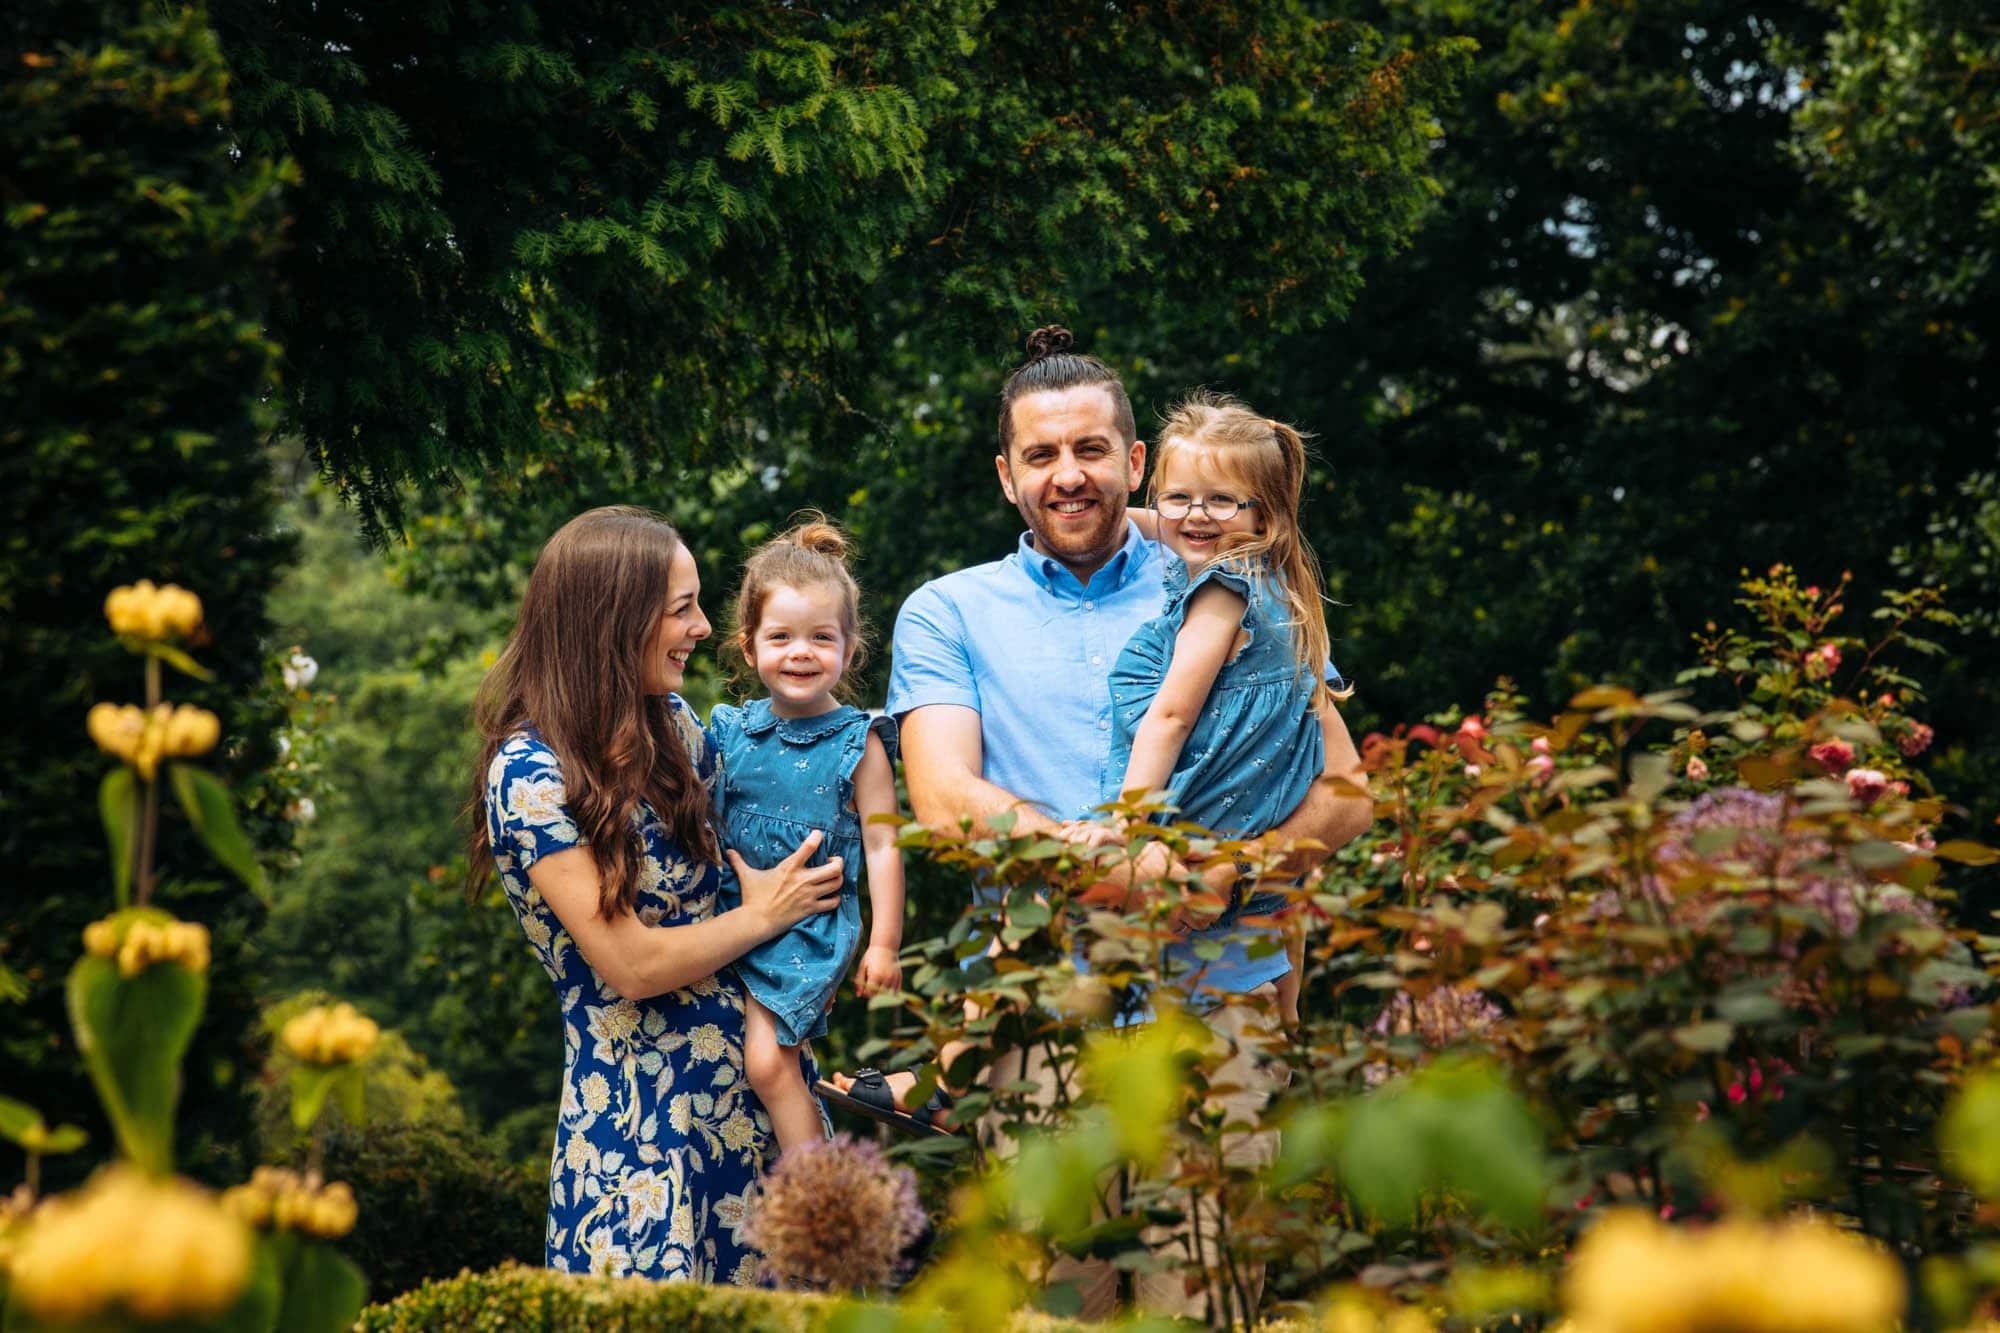 Bramhall Park Family Photographer - The Day Family